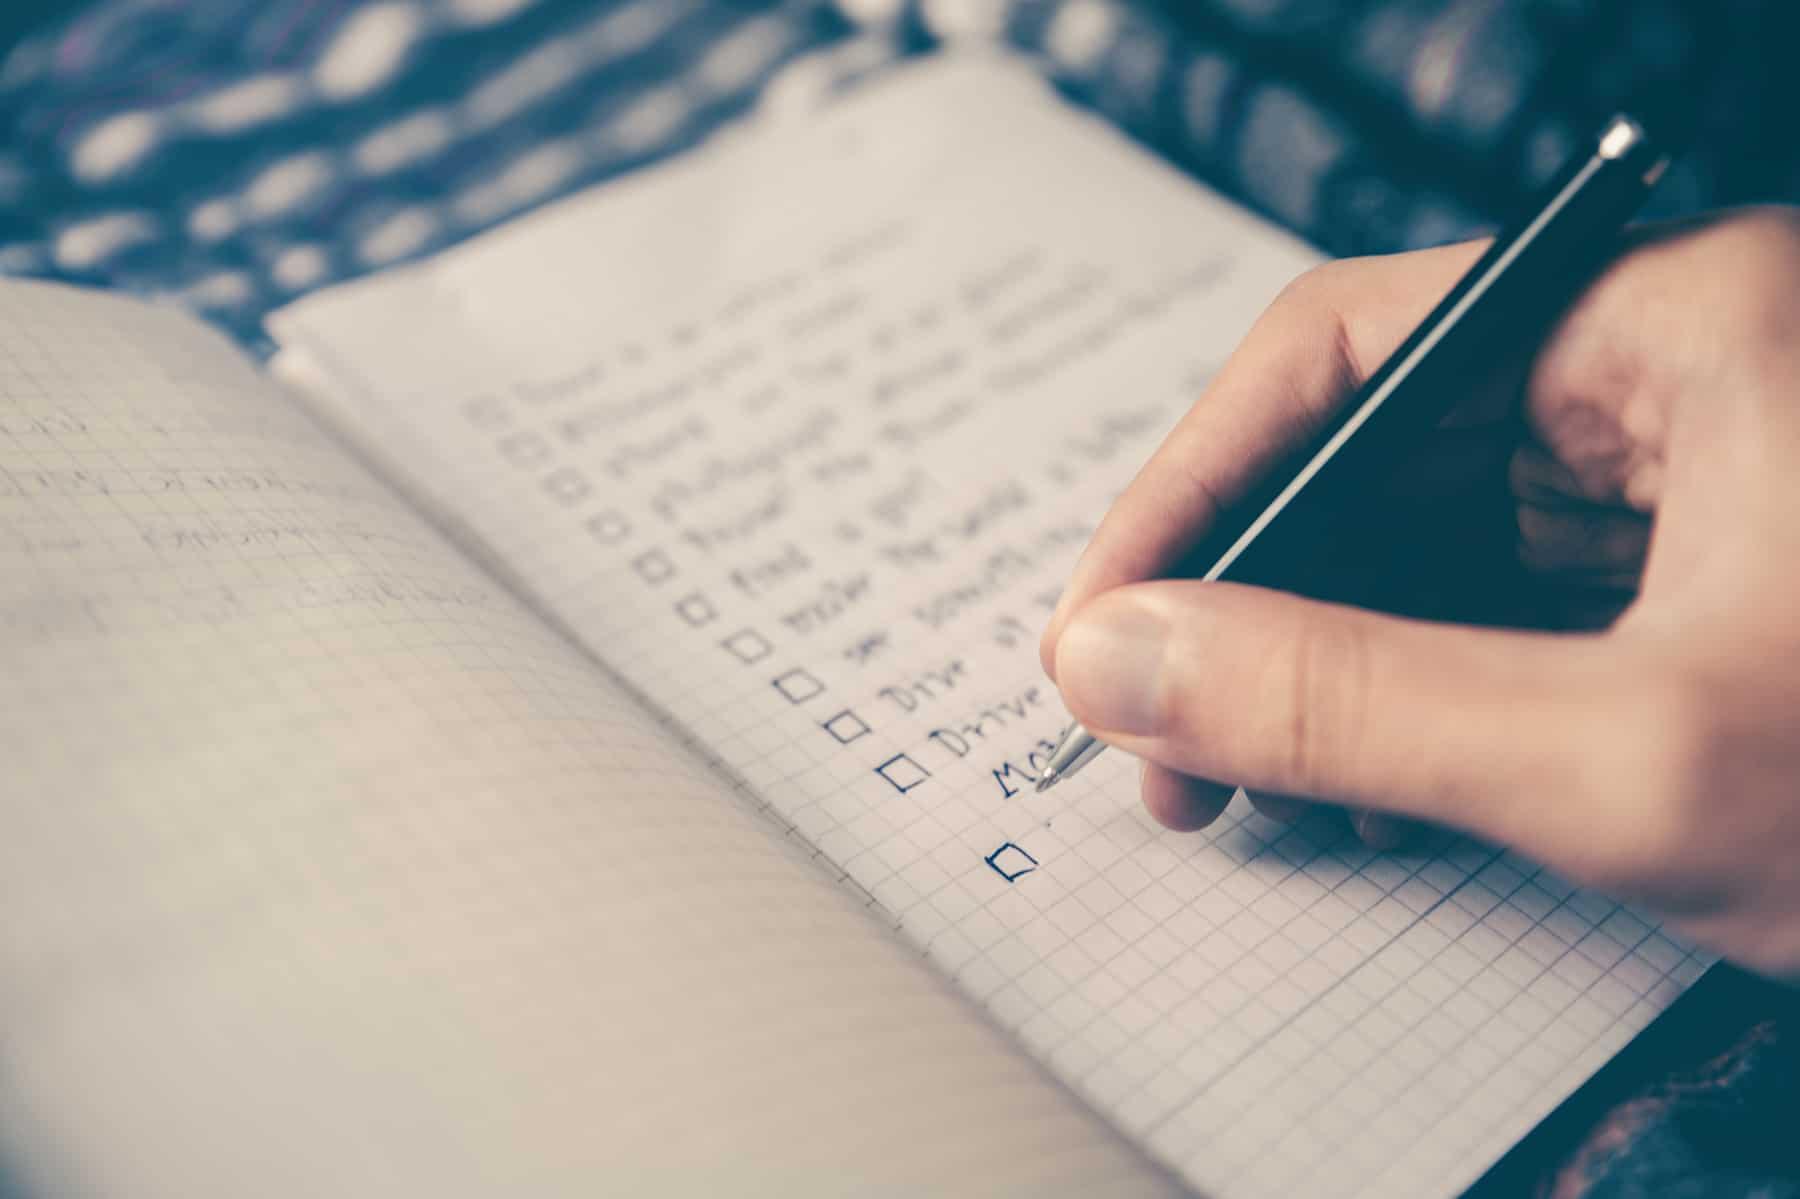 Checklist of Health Coach job requirements